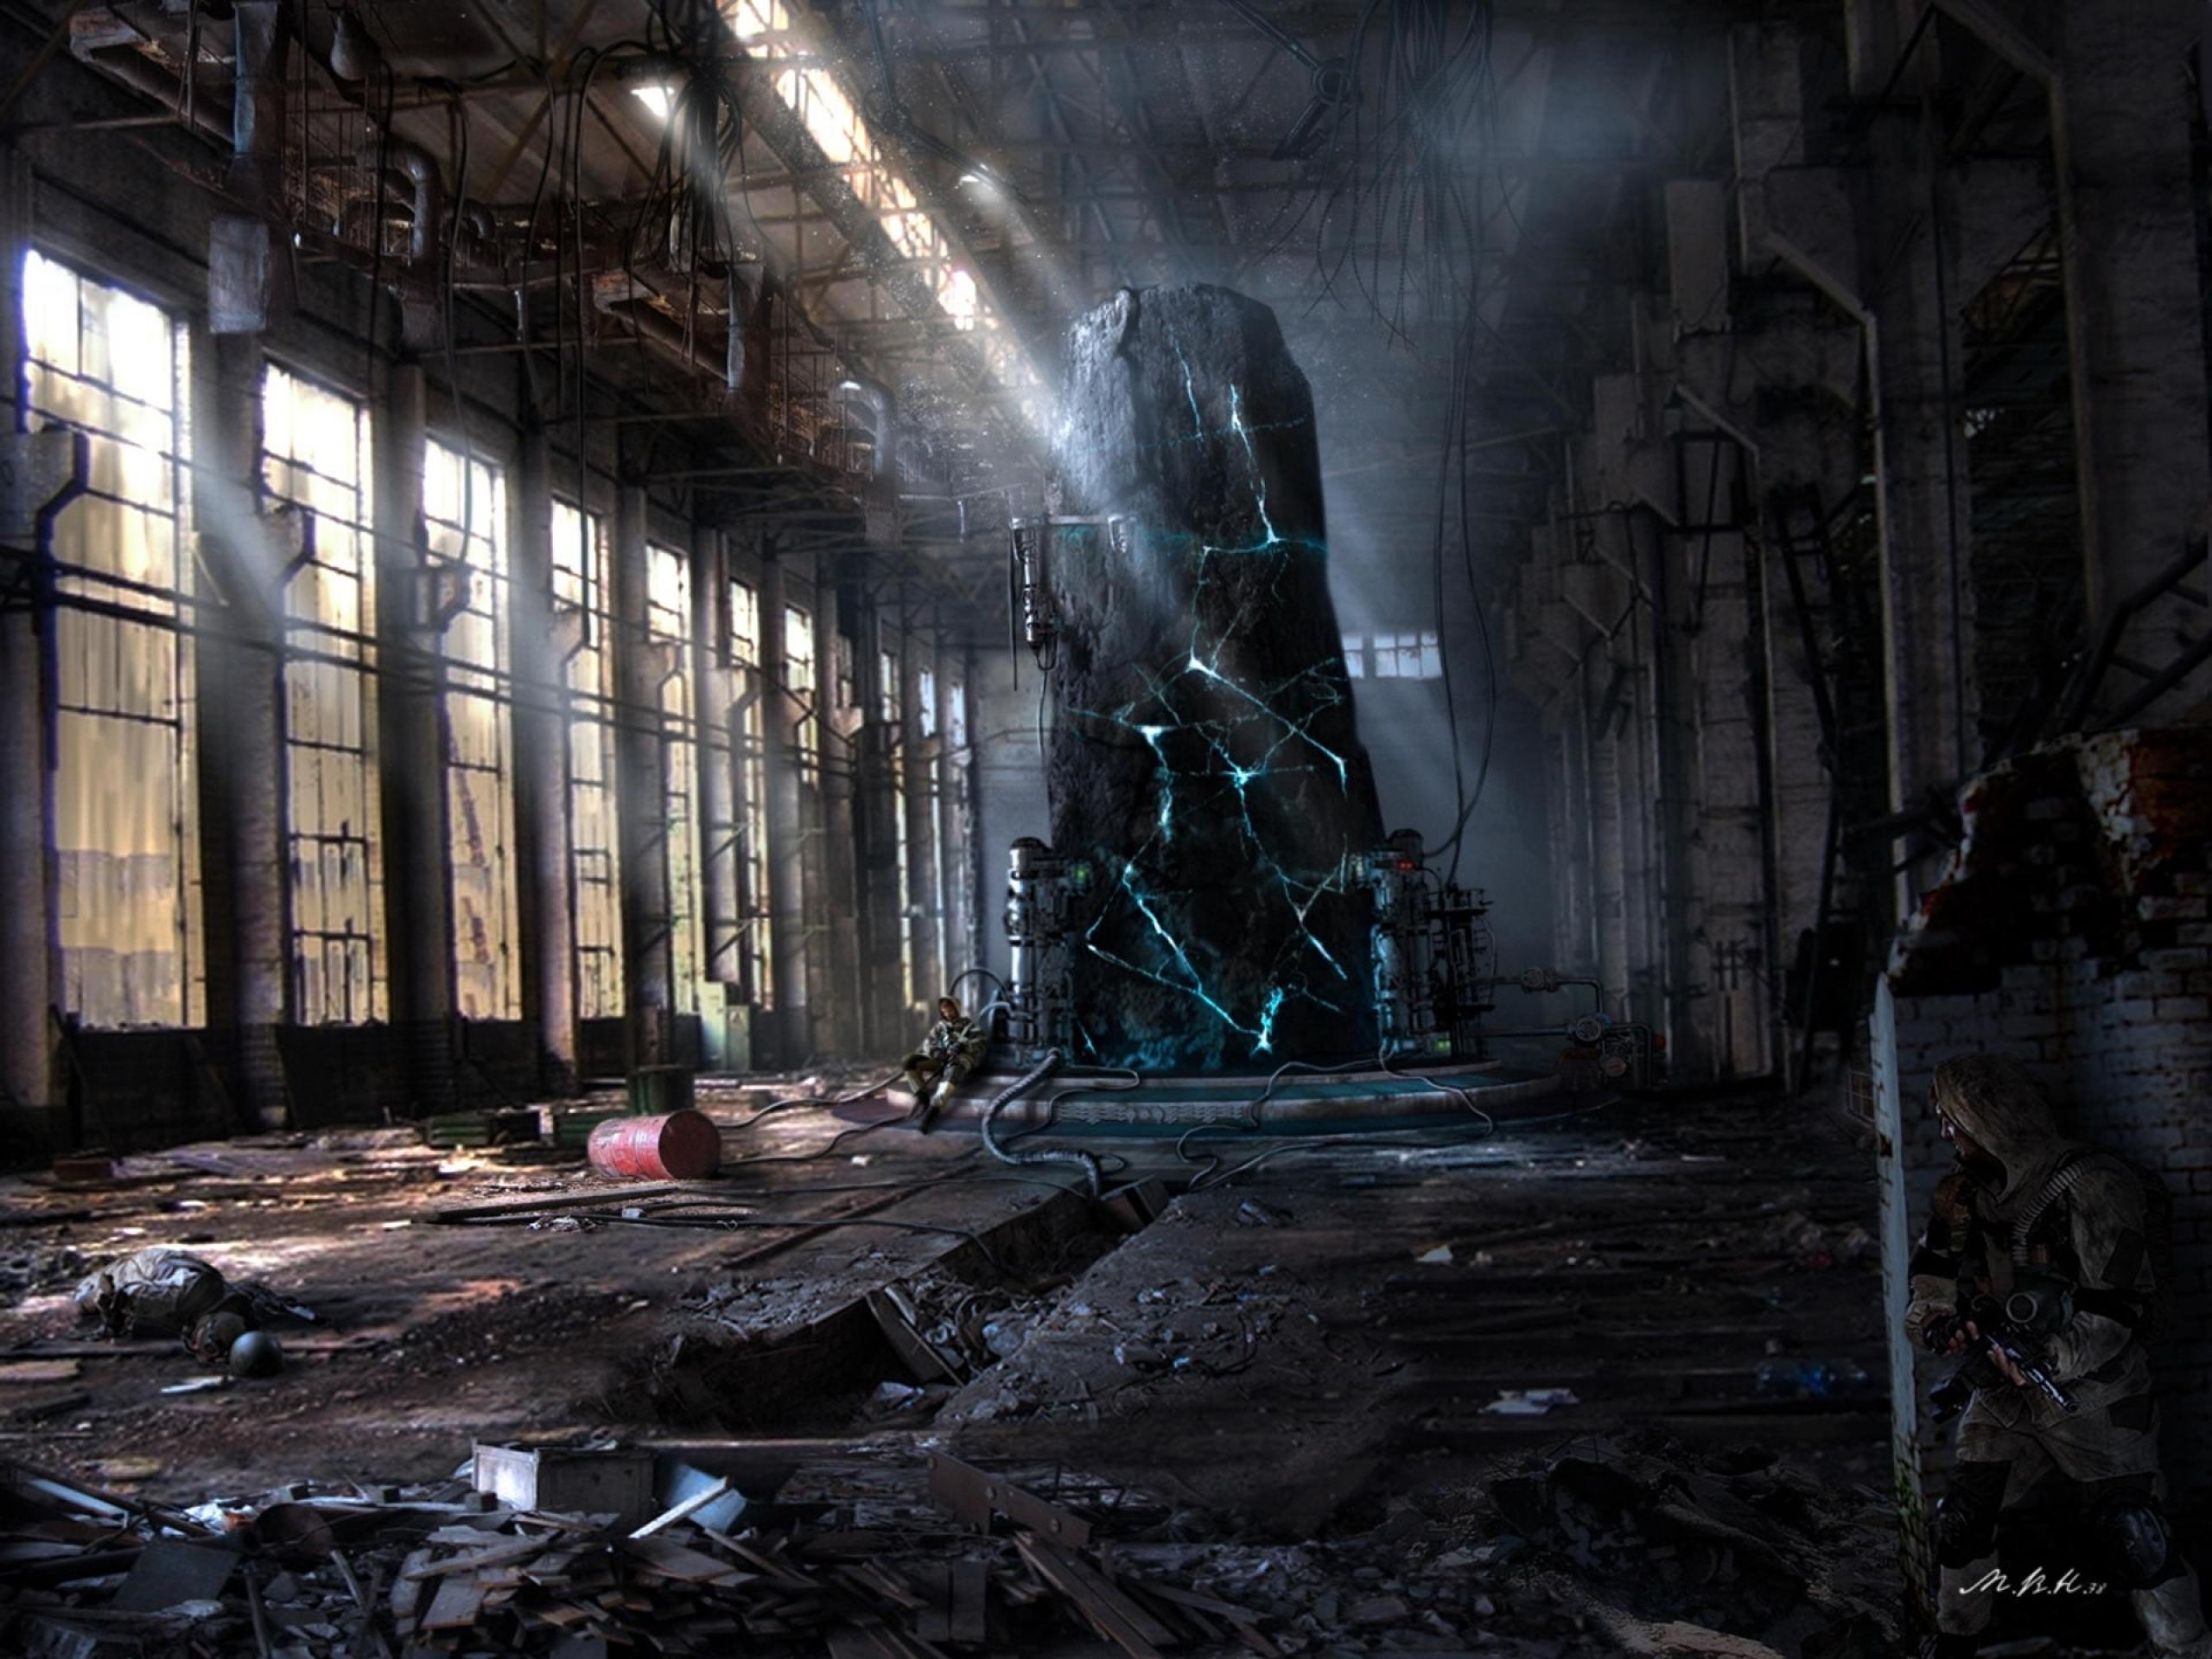 stalker shadow of chernobyl 2